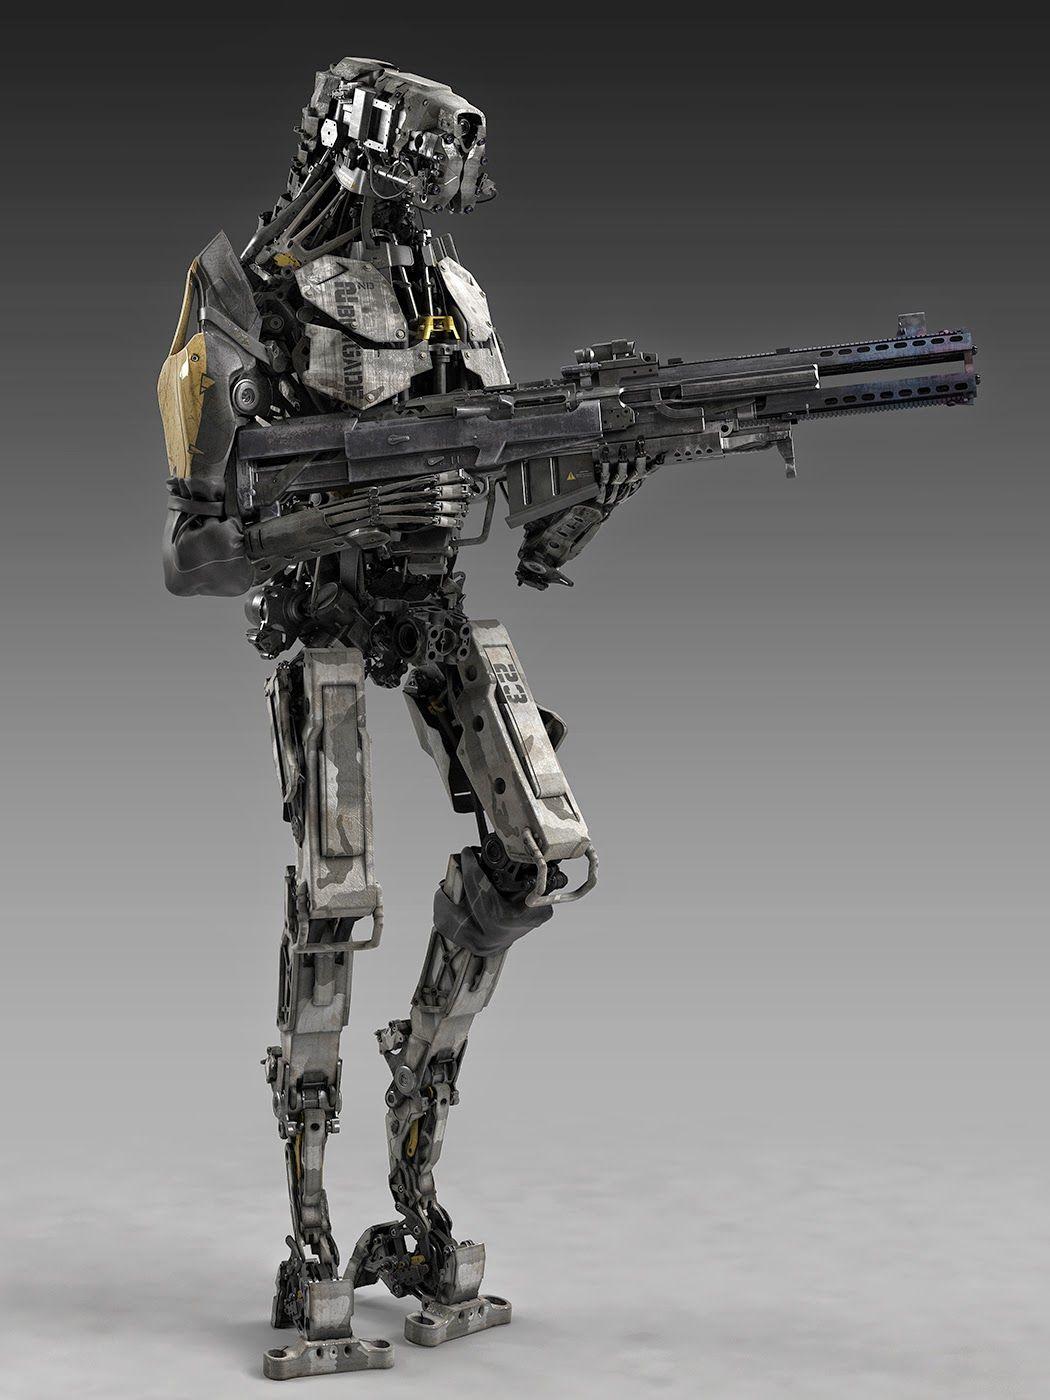 InfantryMech - by Fausto de Martini